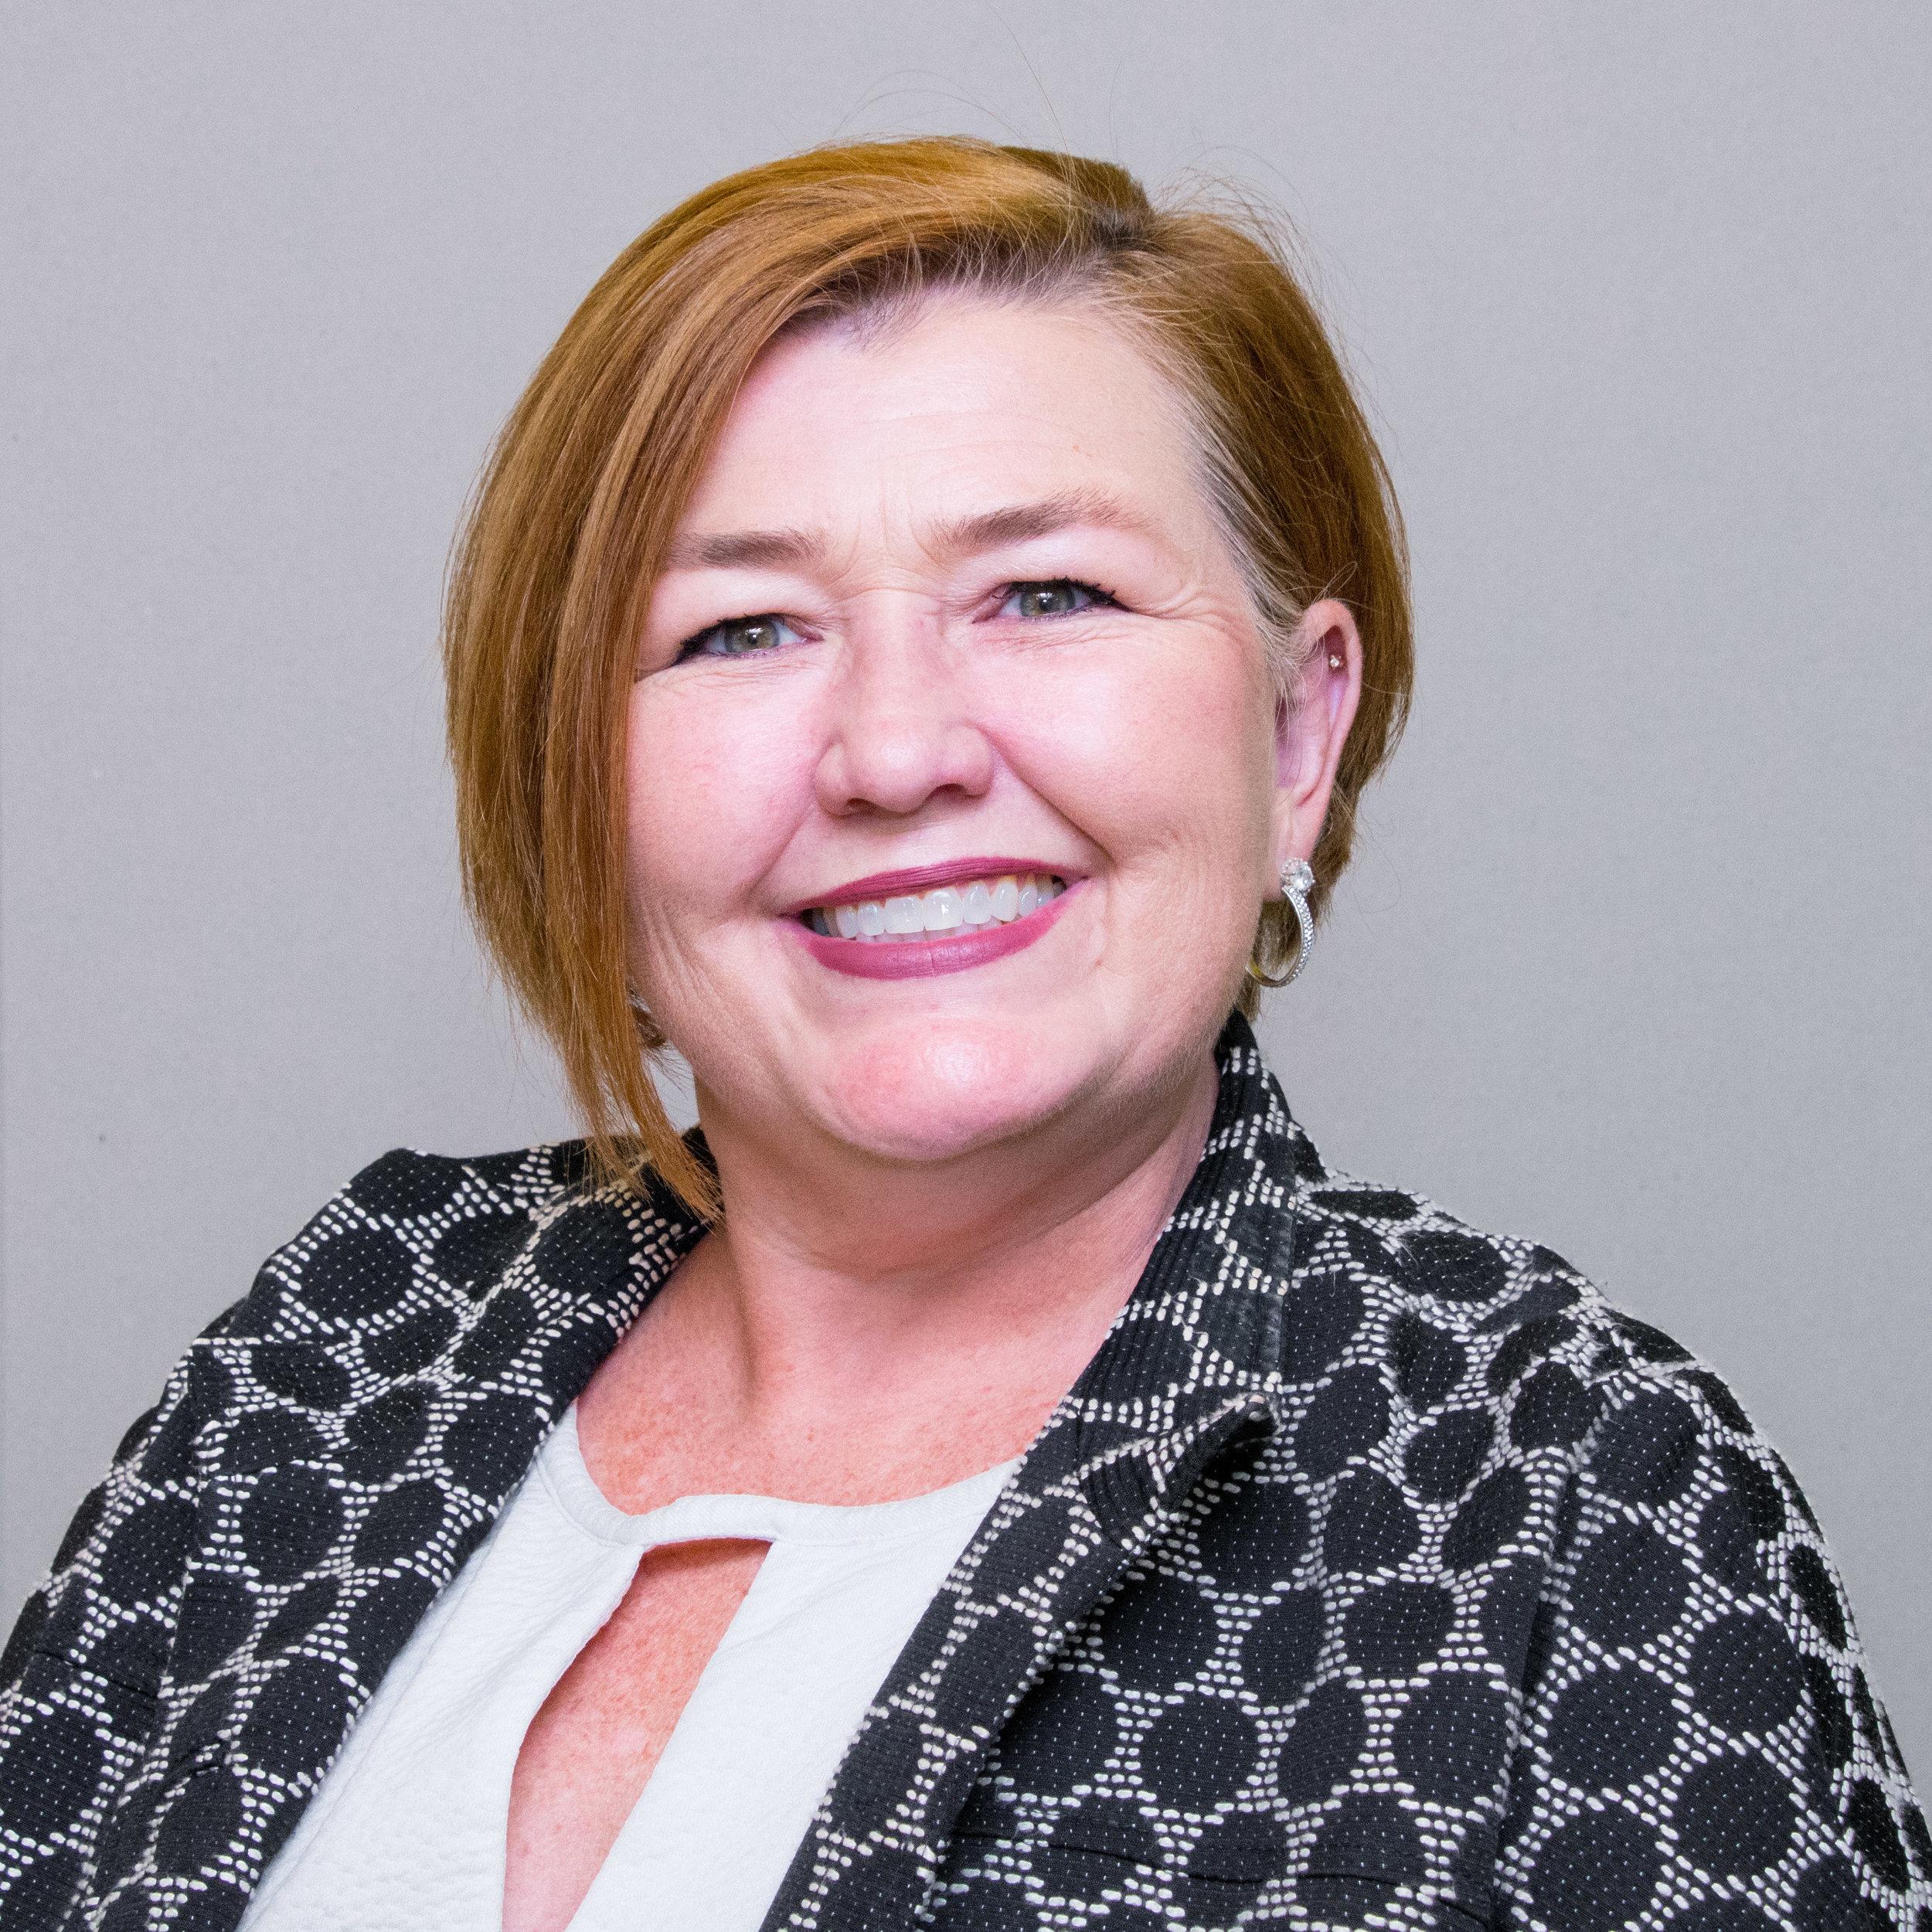 Brenda Arteaga, Director for Special Populations, Harris County Department of Education